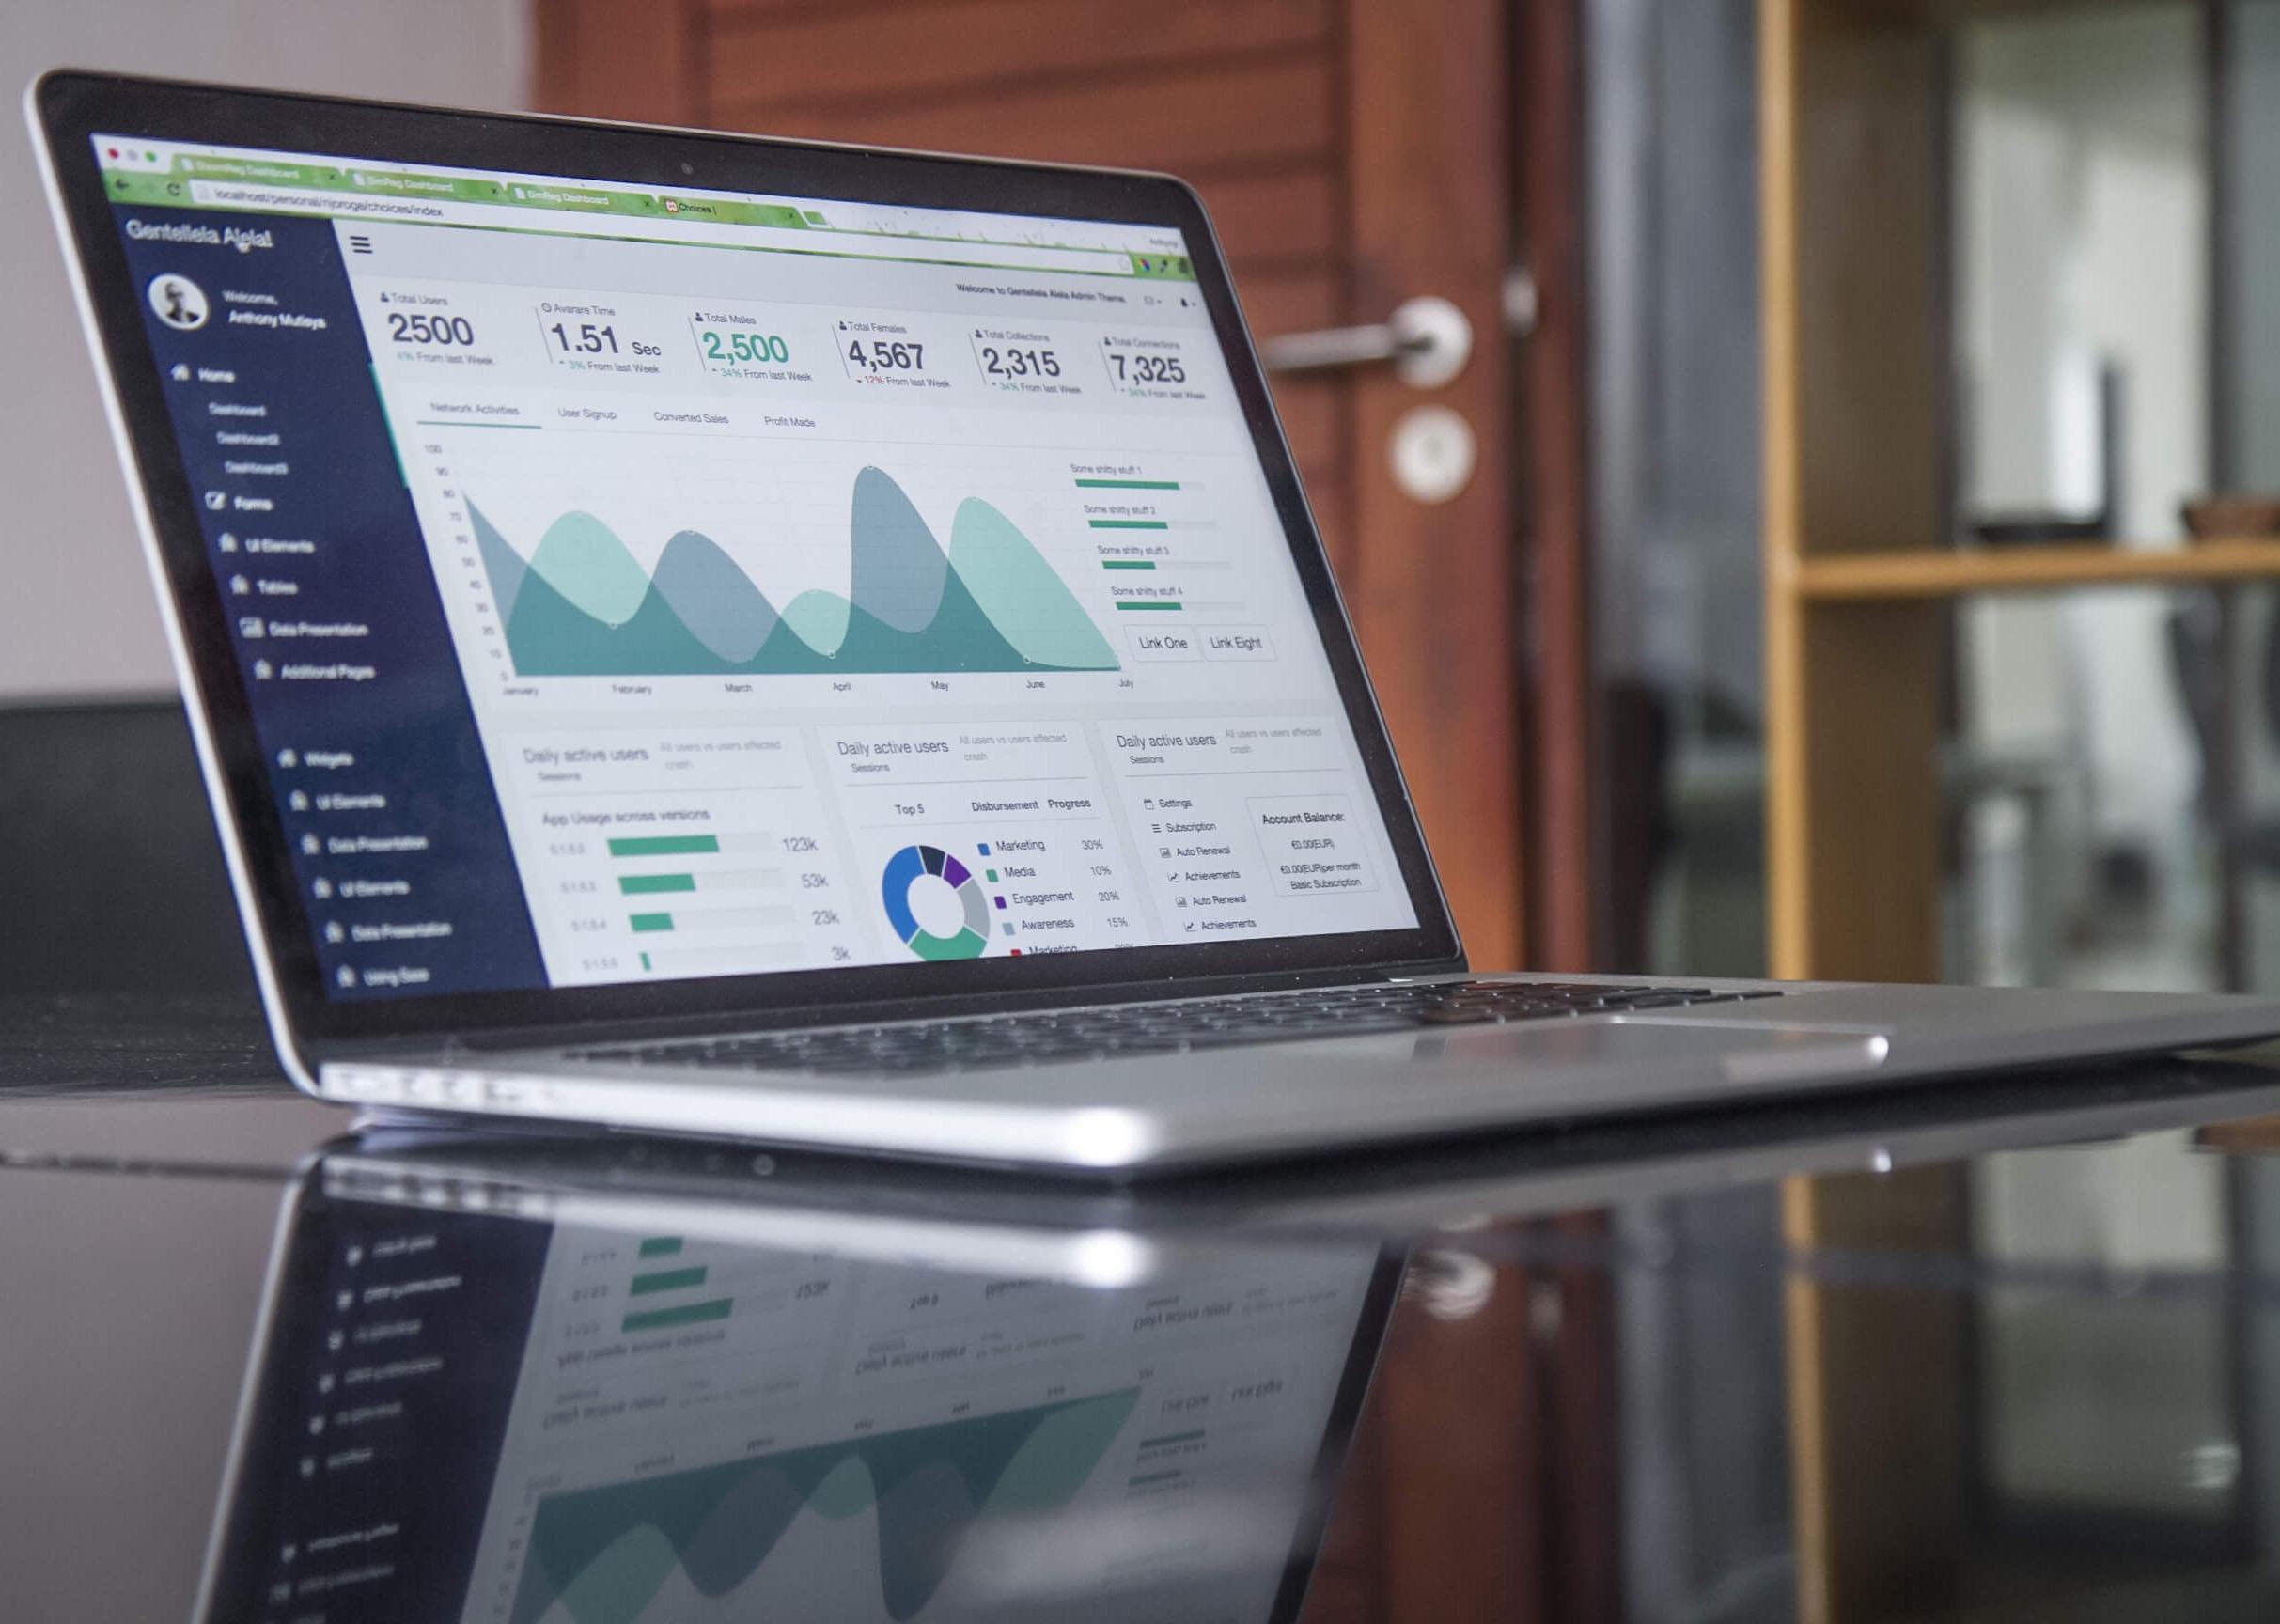 Conquering Digital Marketing